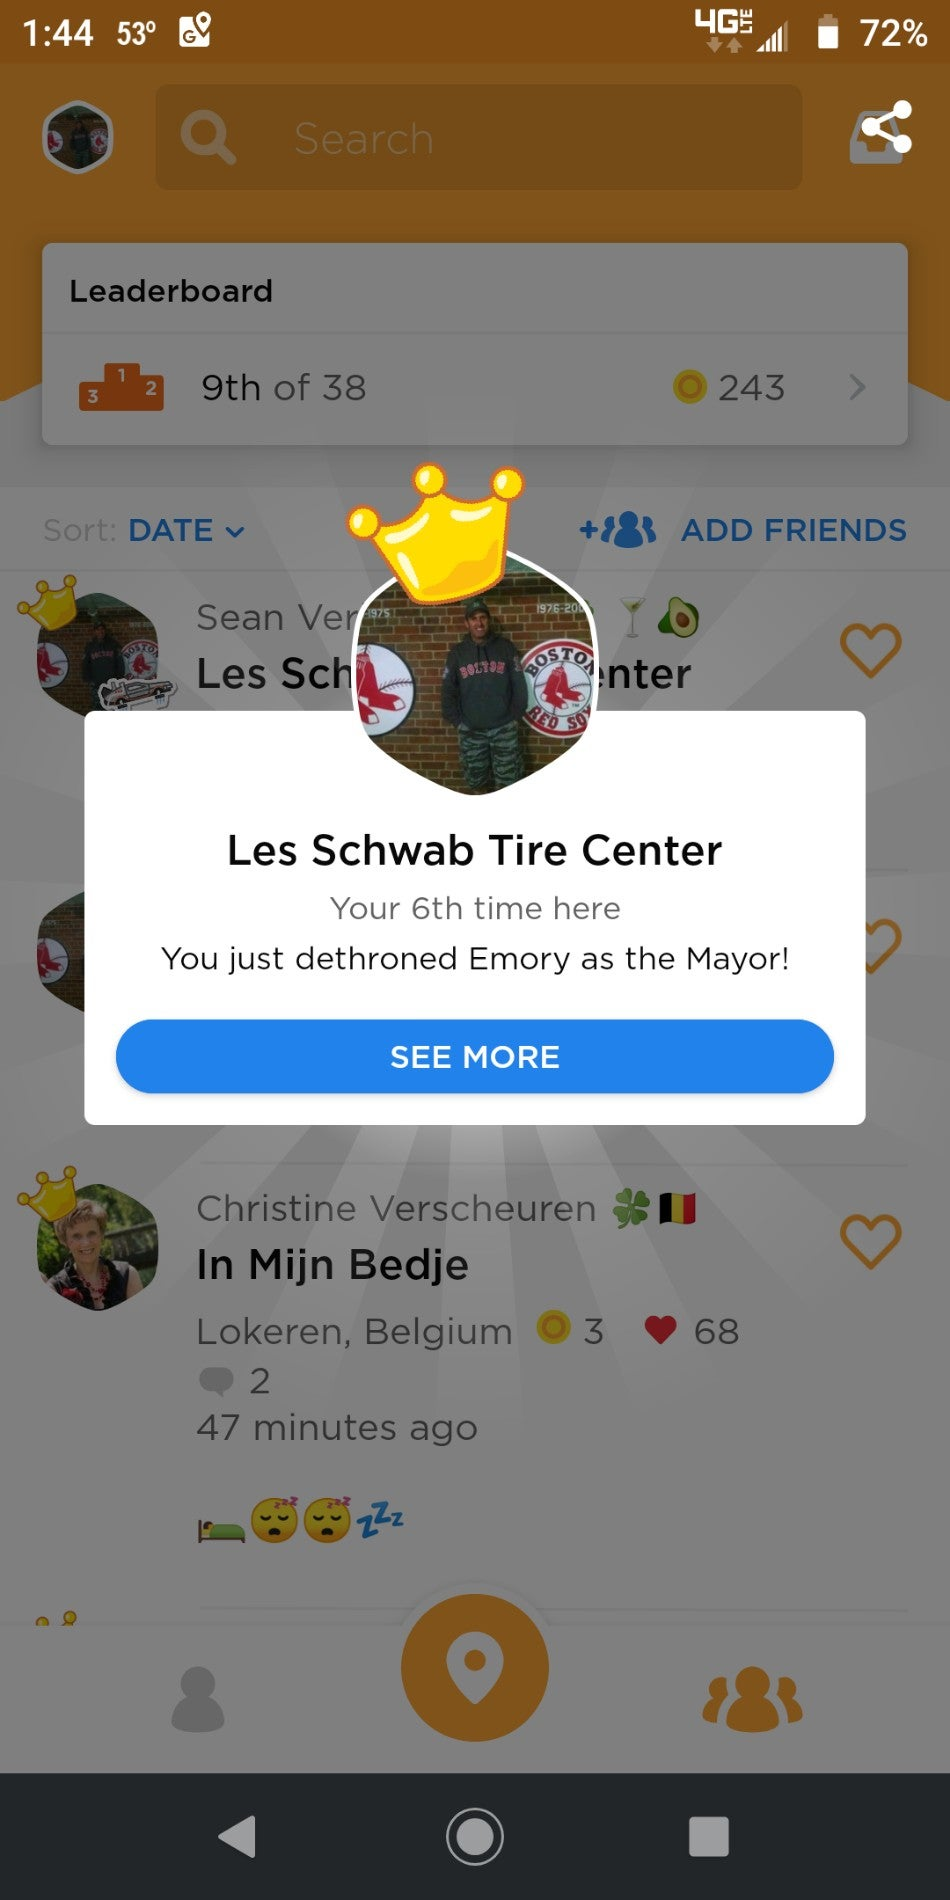 Les Schwab Tire Center 1334 54th Ave E, Fife